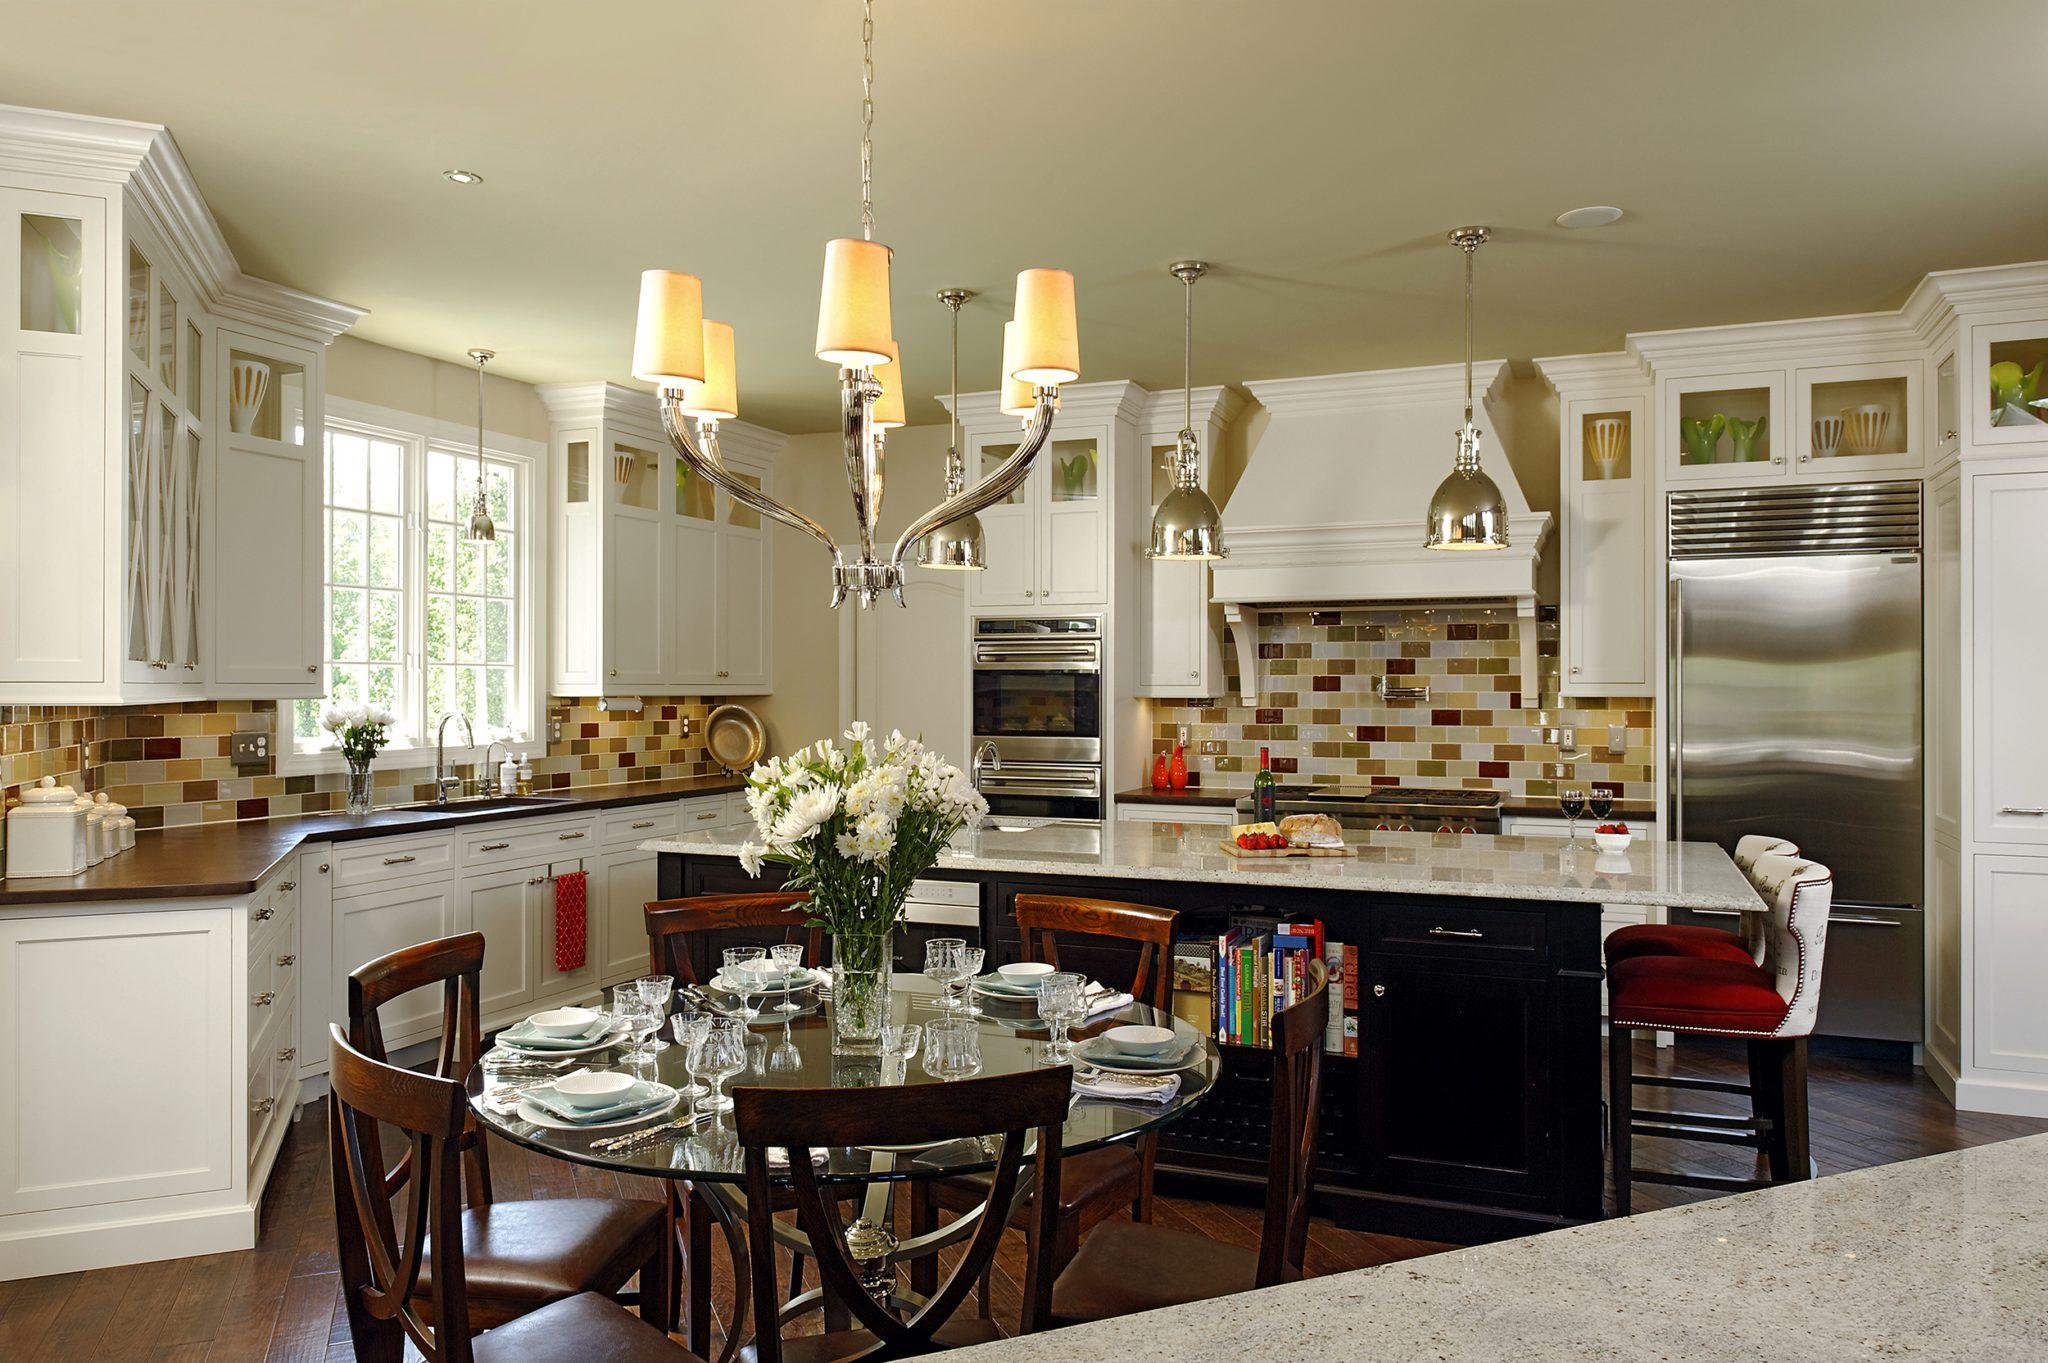 Interior design by Paula Grace Designs